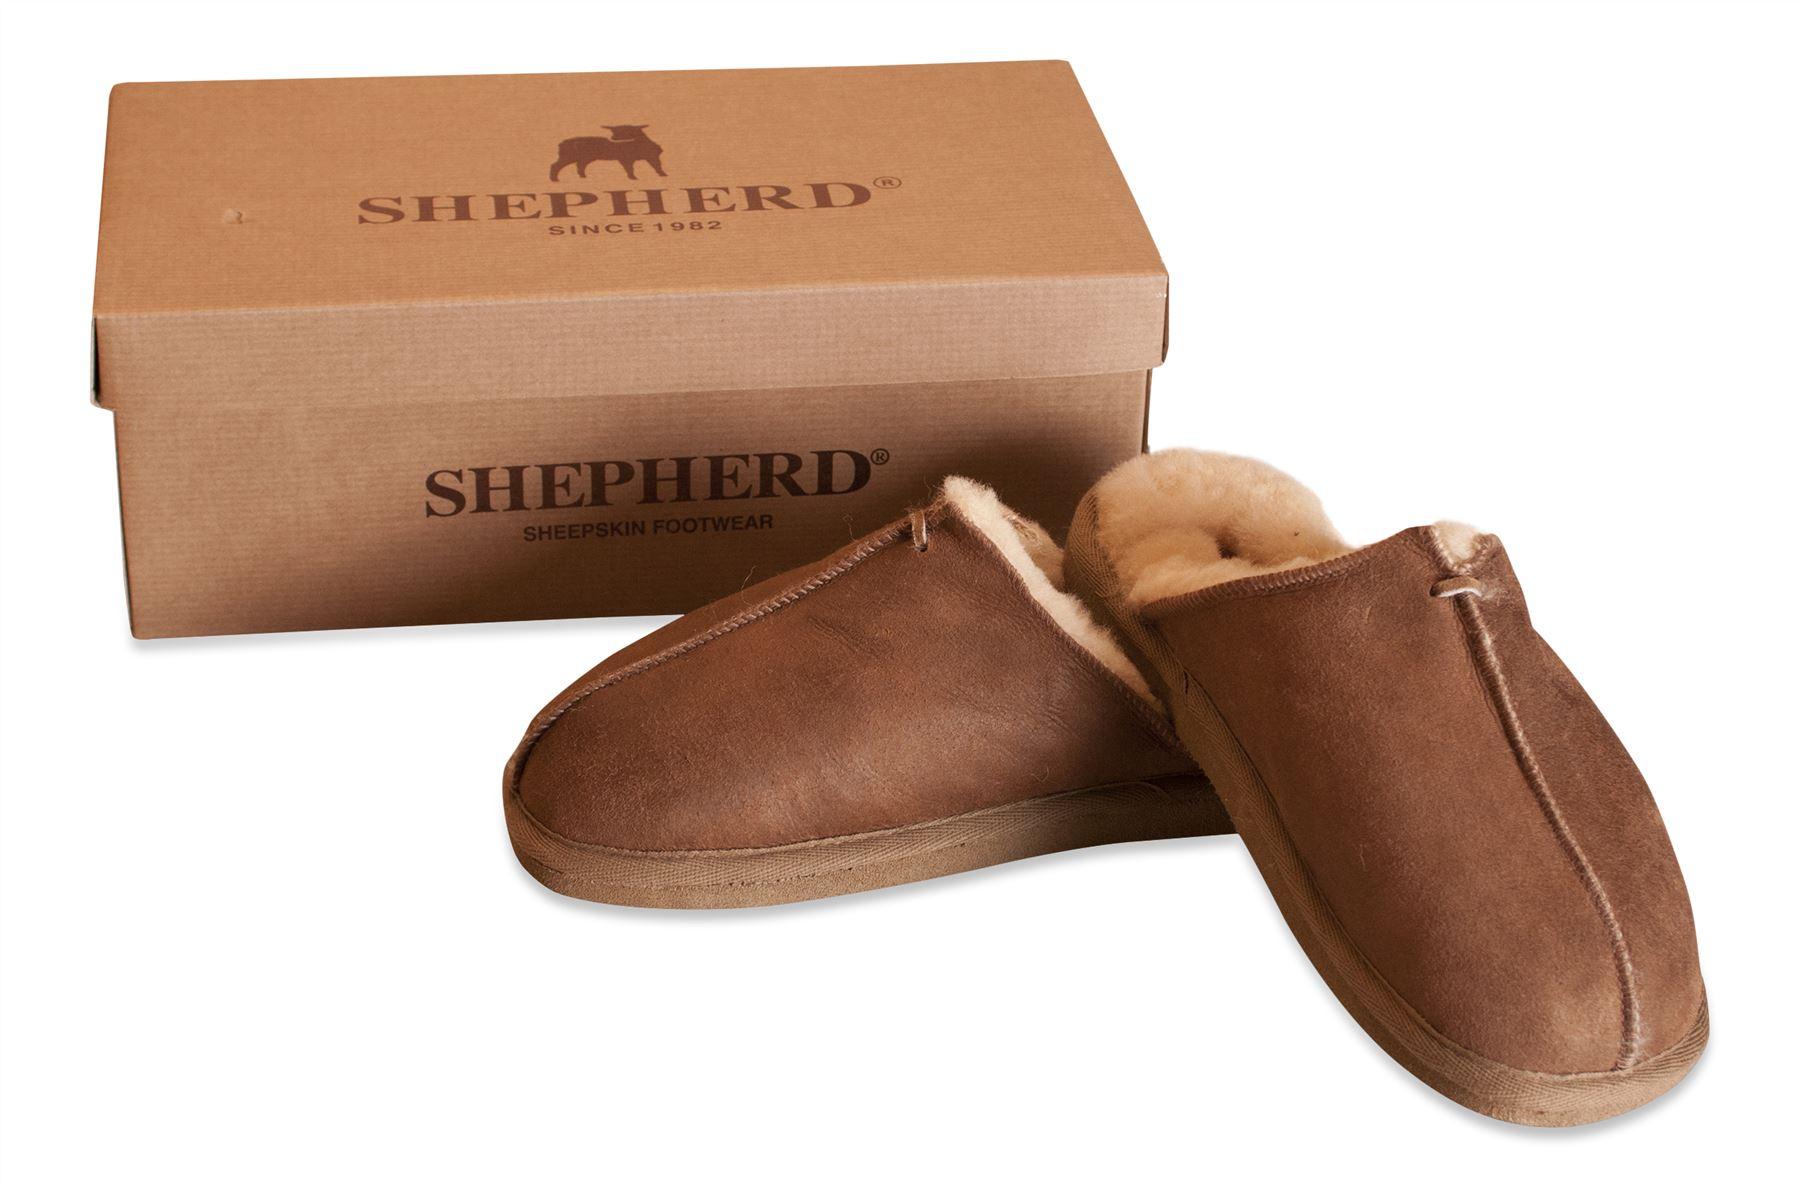 648cc8fec5be Shepherd Mens Genuine Sheepskin Slippers Mules Hard Rubber Sole HUGO ...